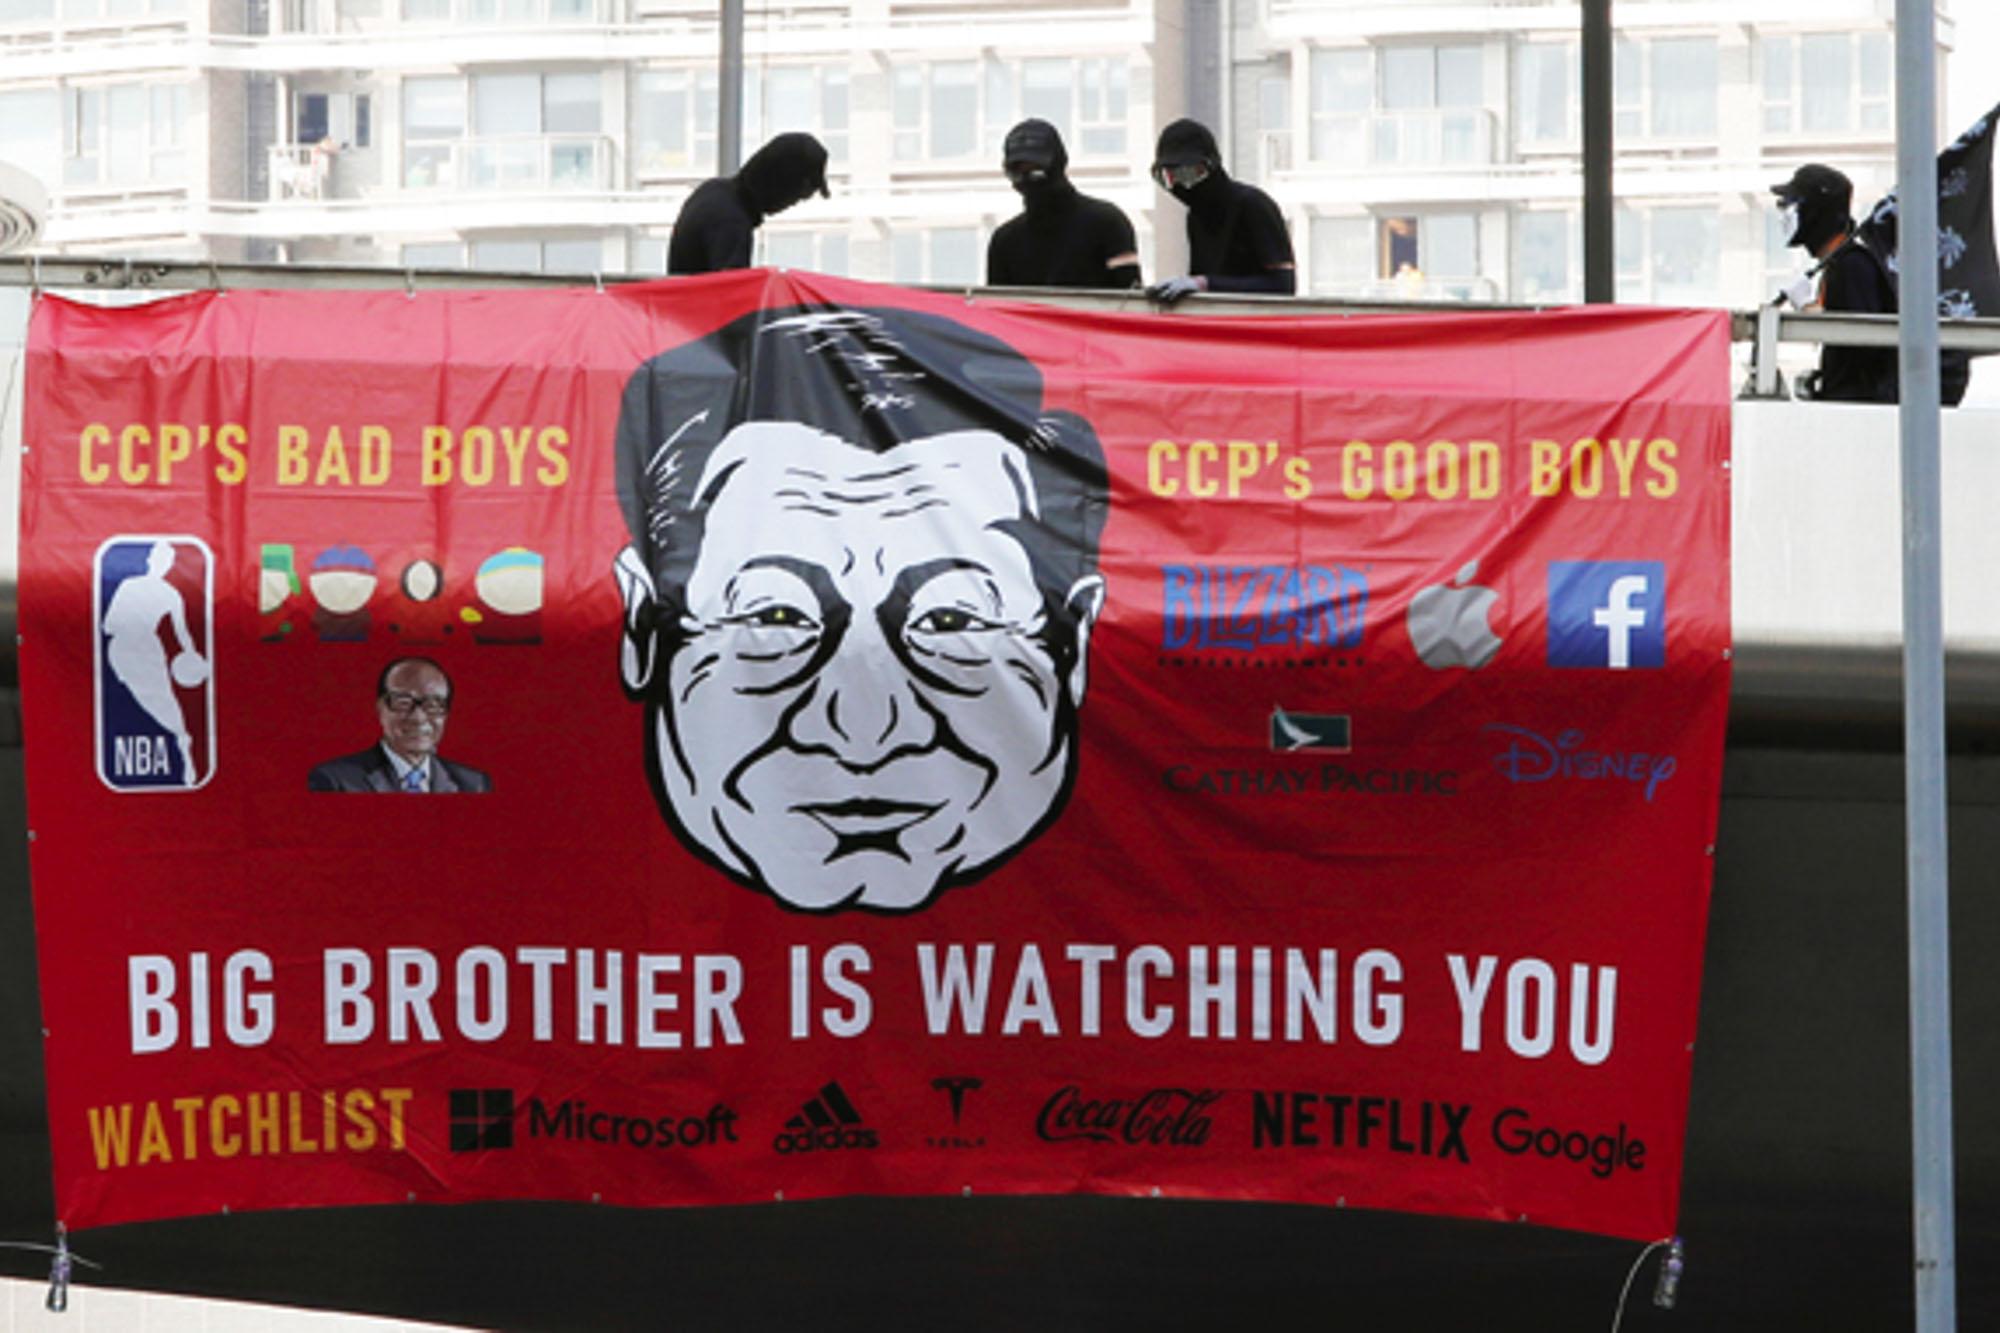 Num cartaz com a imagem de Xi Jiping, líder chinês, lê-se 'Big Brother is watching you'. Fonte: Reuters